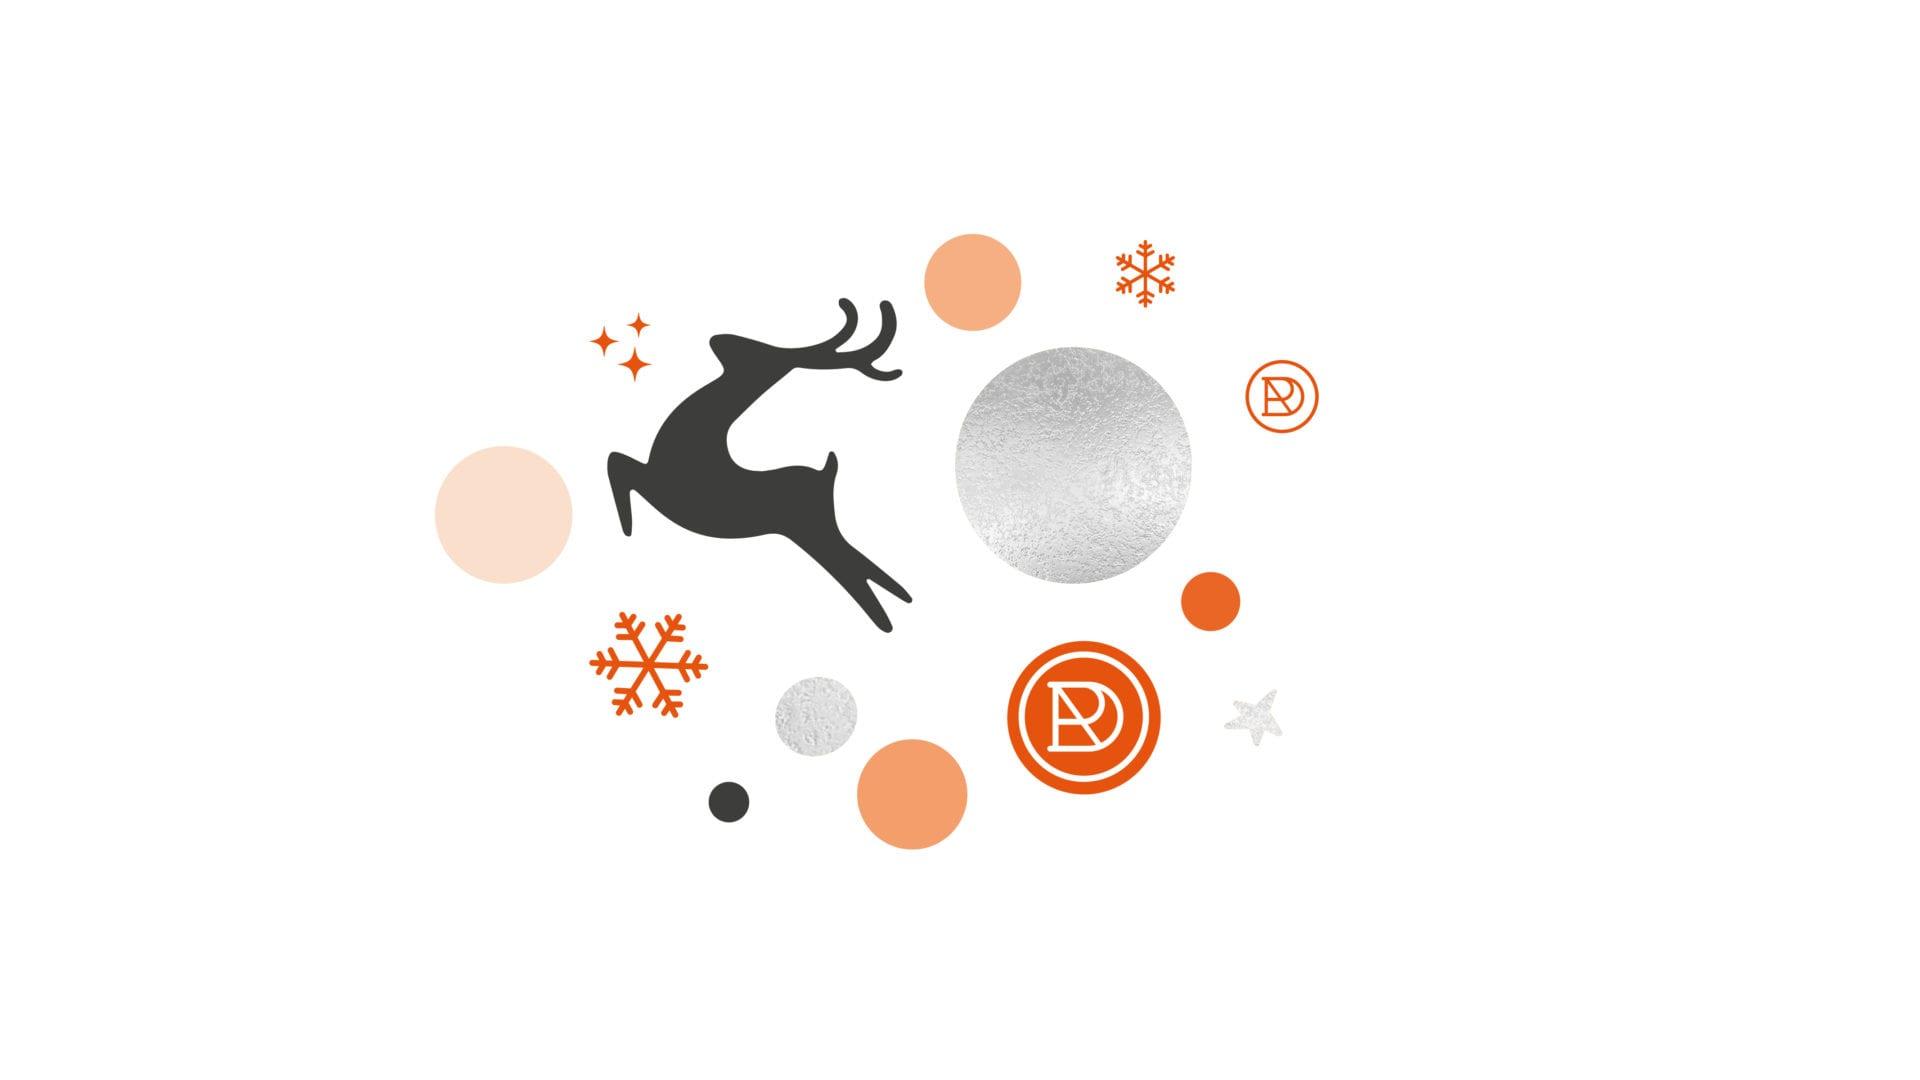 RAD Christmas Web Images-2021-Radstone